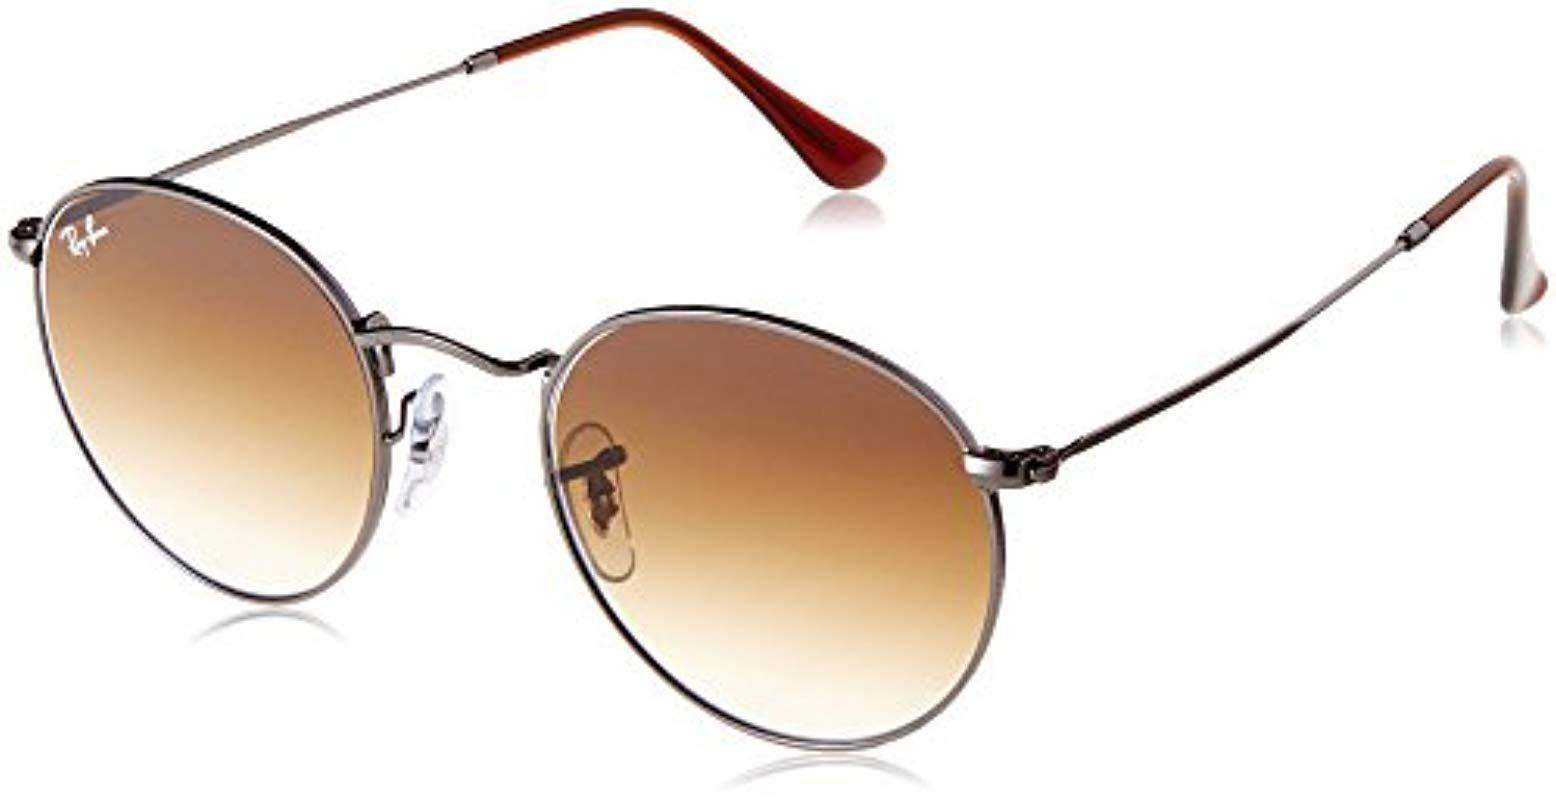 Ray-Ban Rayban 0rb3447n 004 51 50 Sunglasses, Gunmetal ... 891f7ab788cc